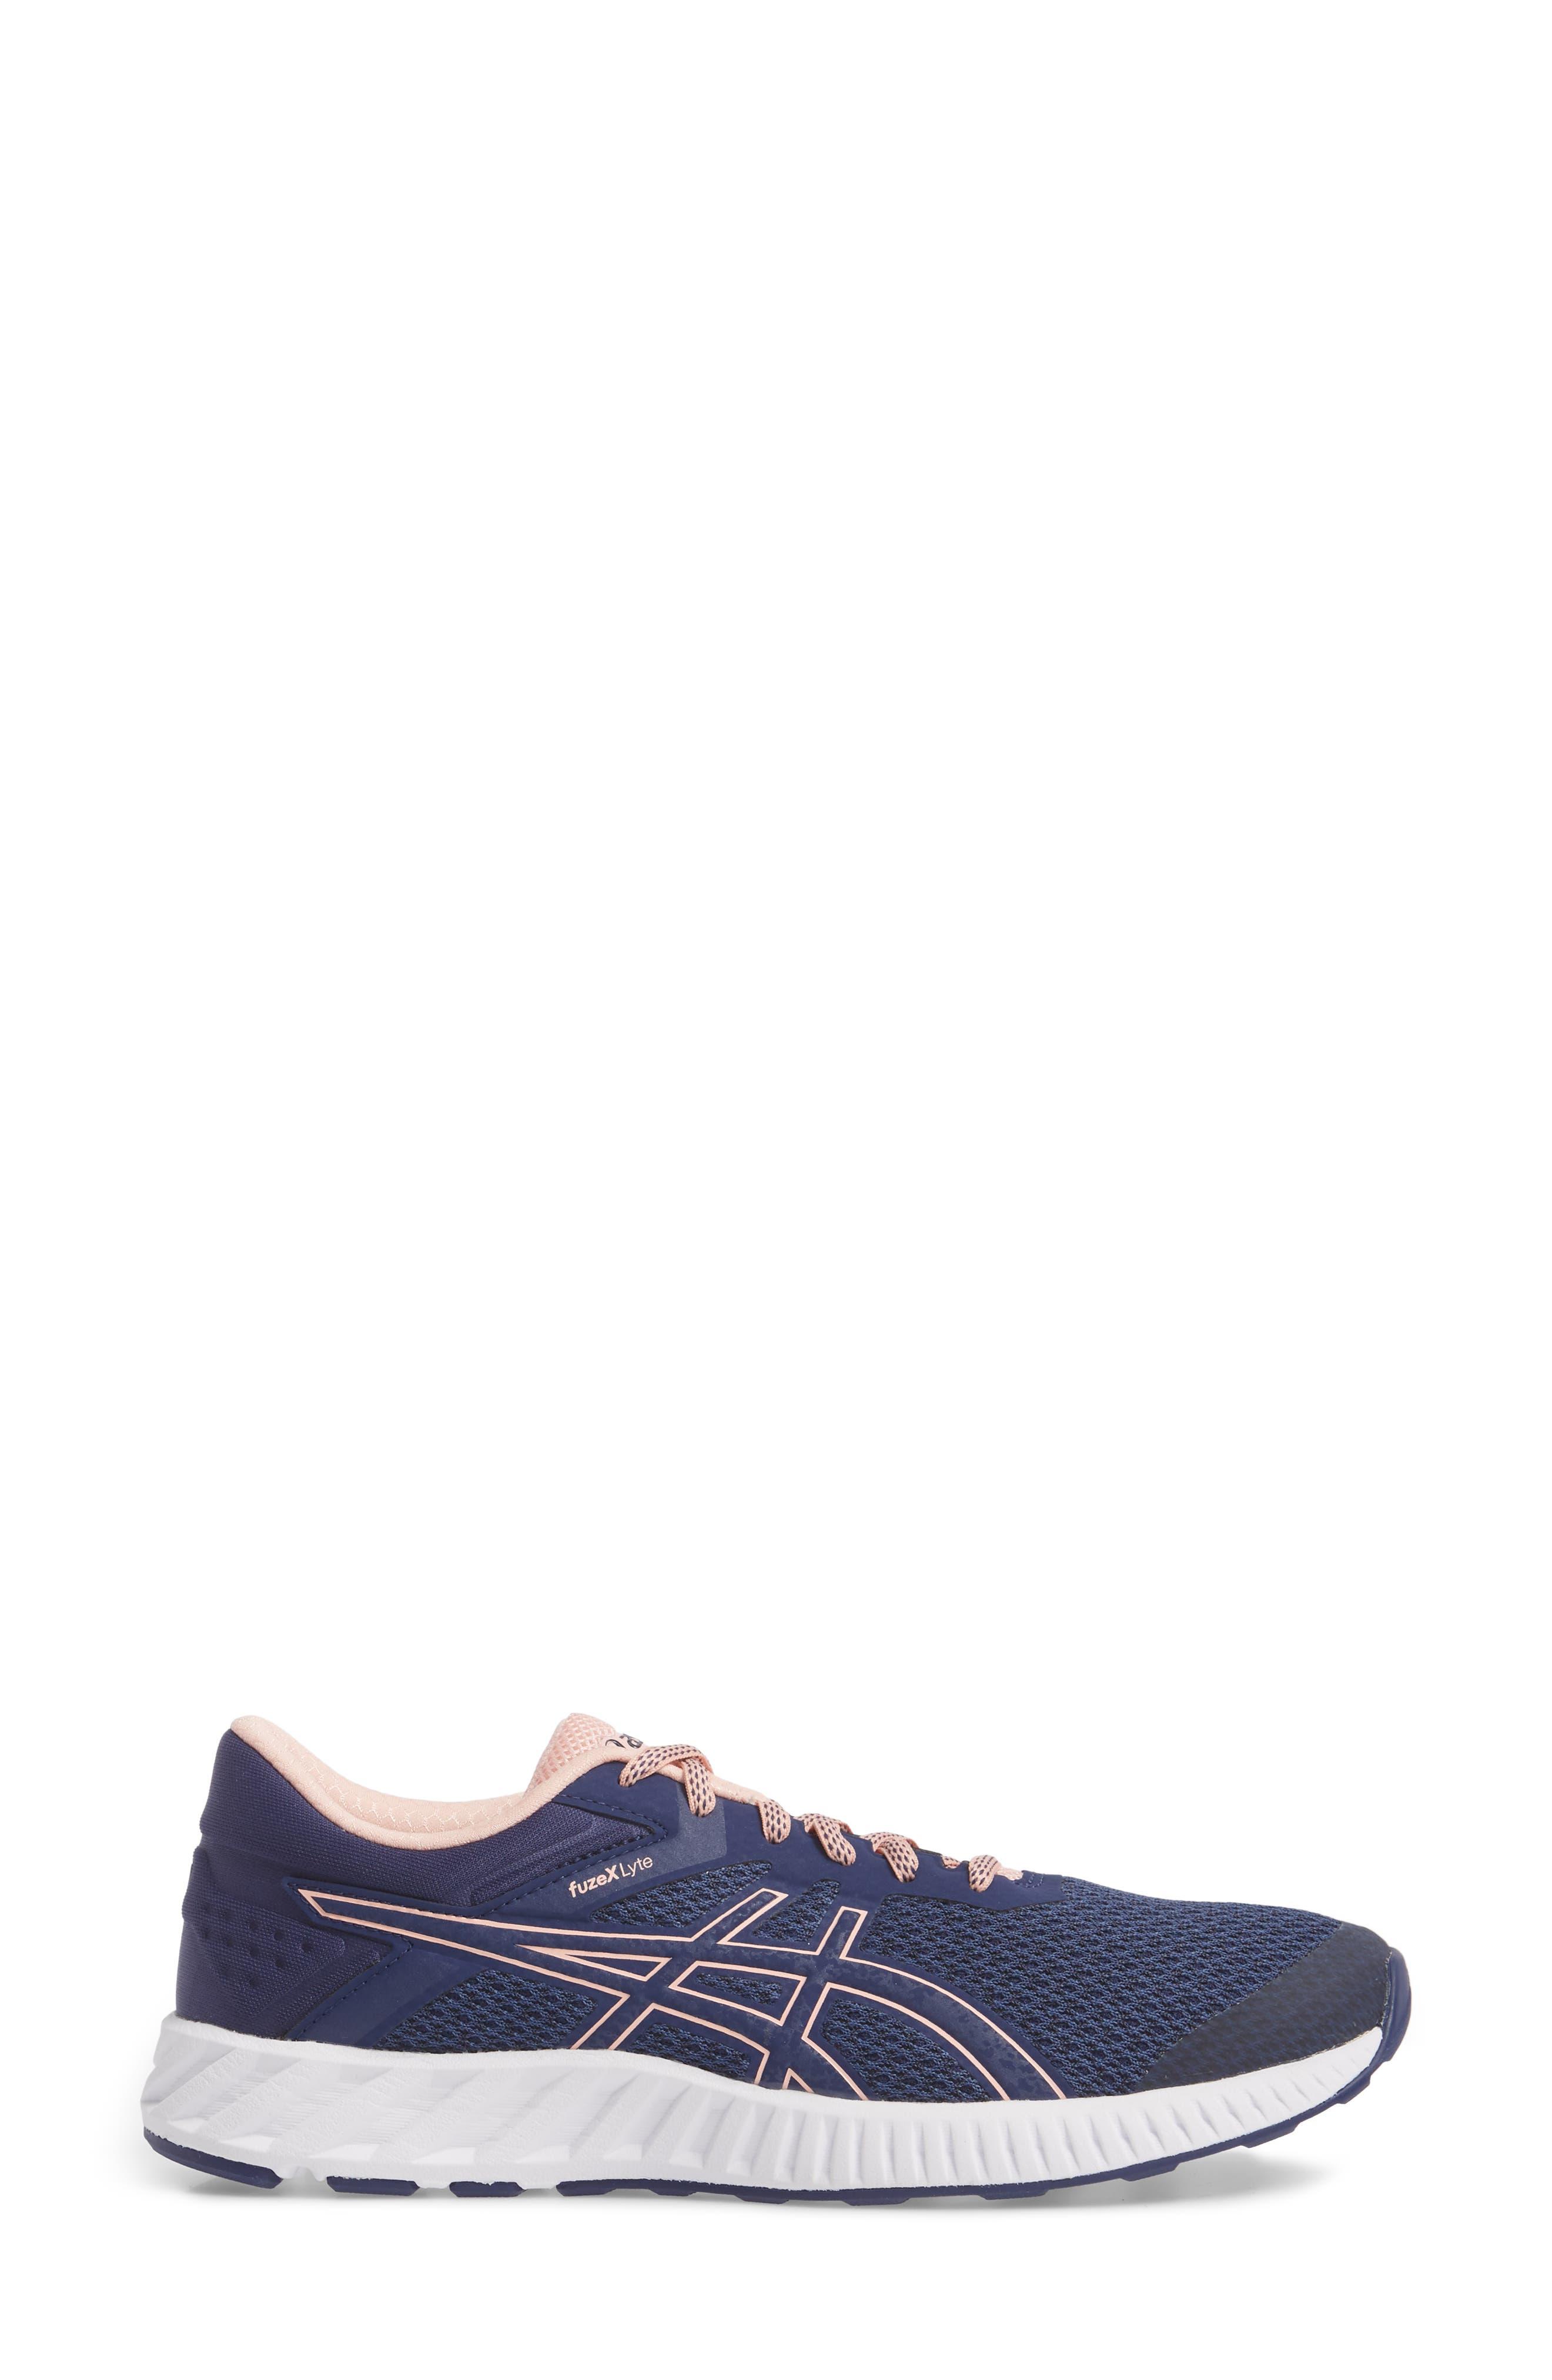 FuzeX Lyte 2 Running Shoe,                             Alternate thumbnail 3, color,                             INDIGO BLUE/ FROSTED ROSE